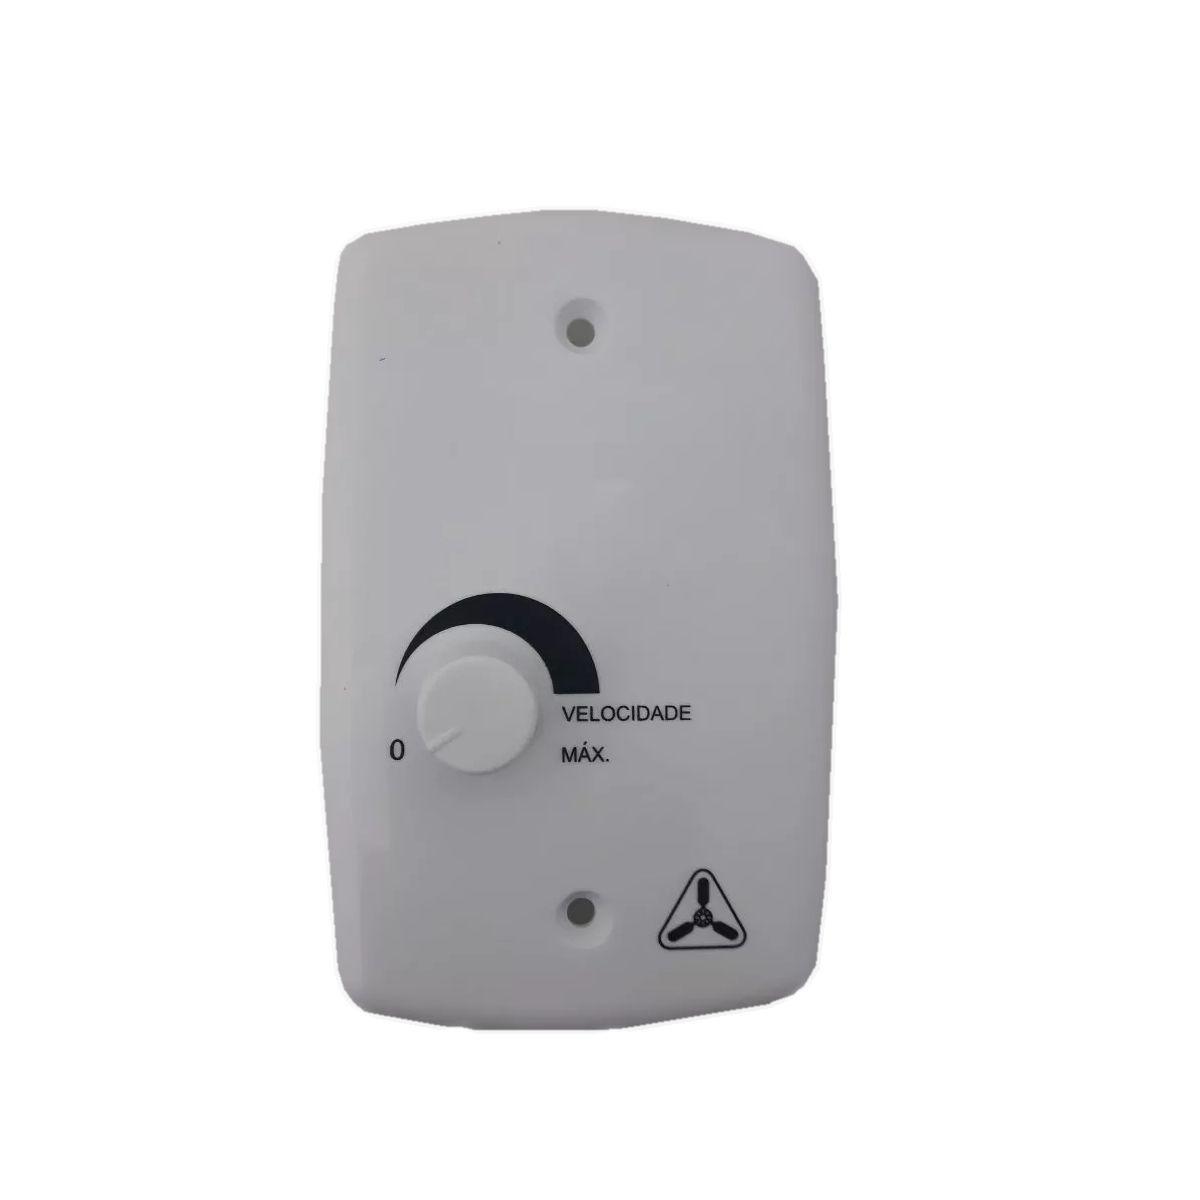 Controle De Velocidade Ventilador 50 / 60cm Venti-delta